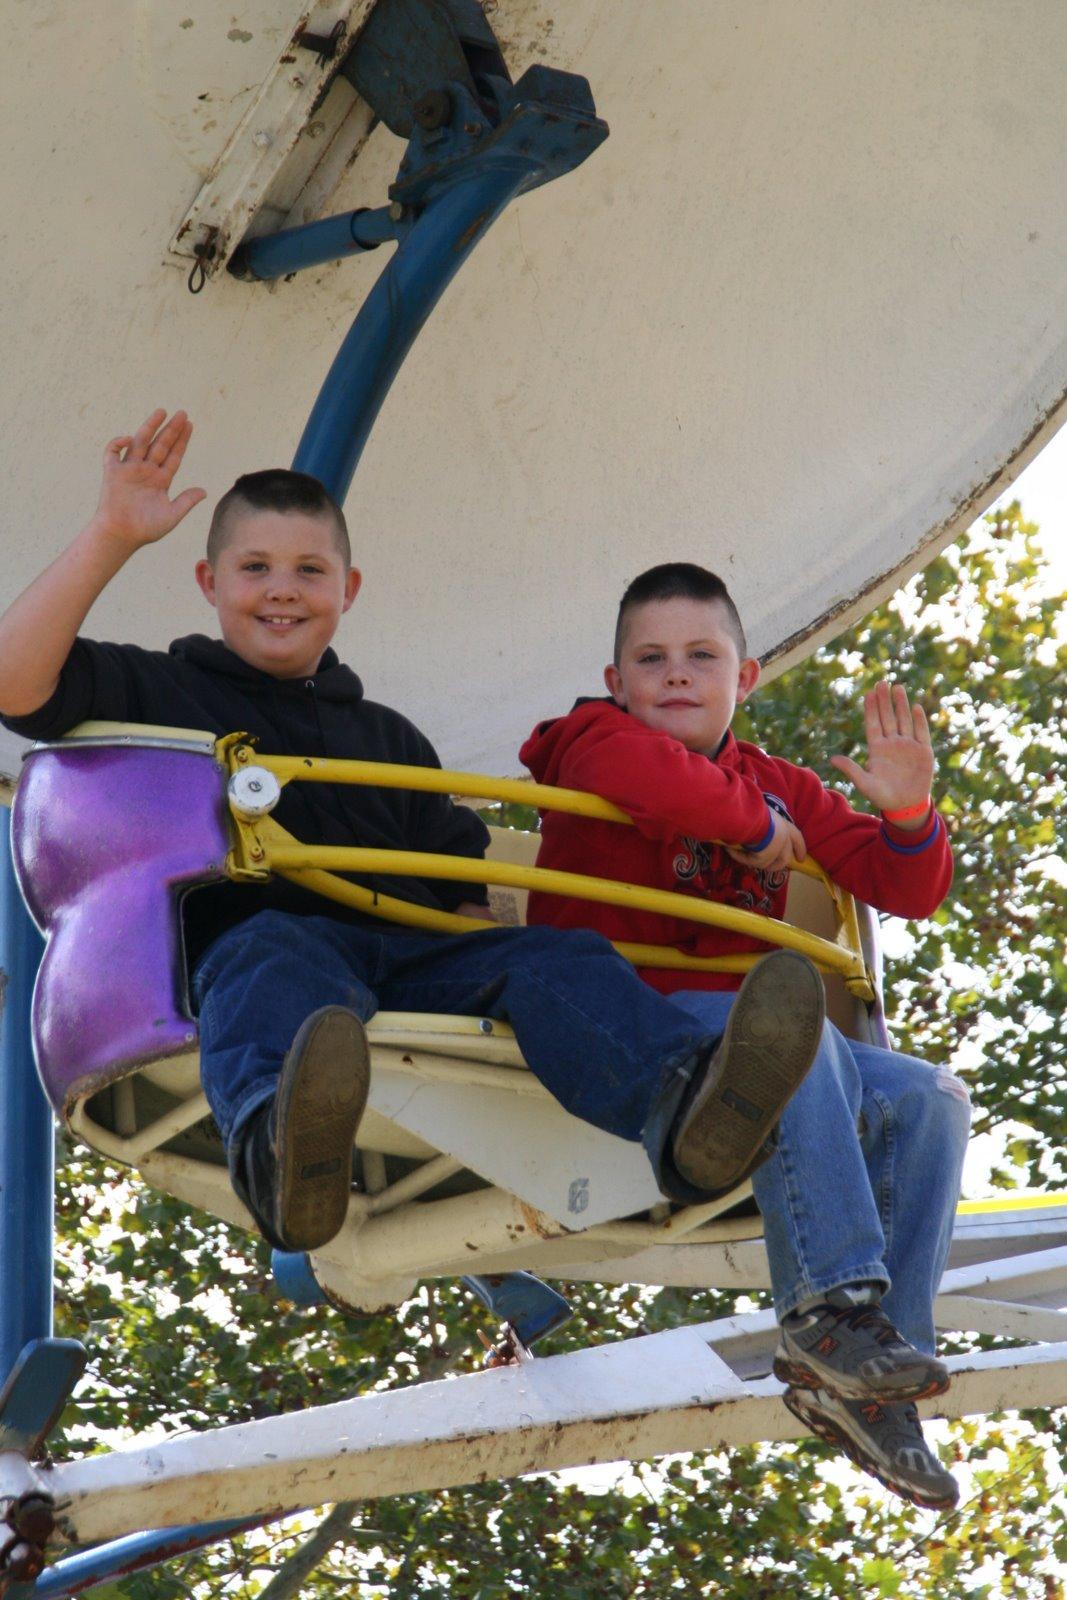 carnival-rides-54